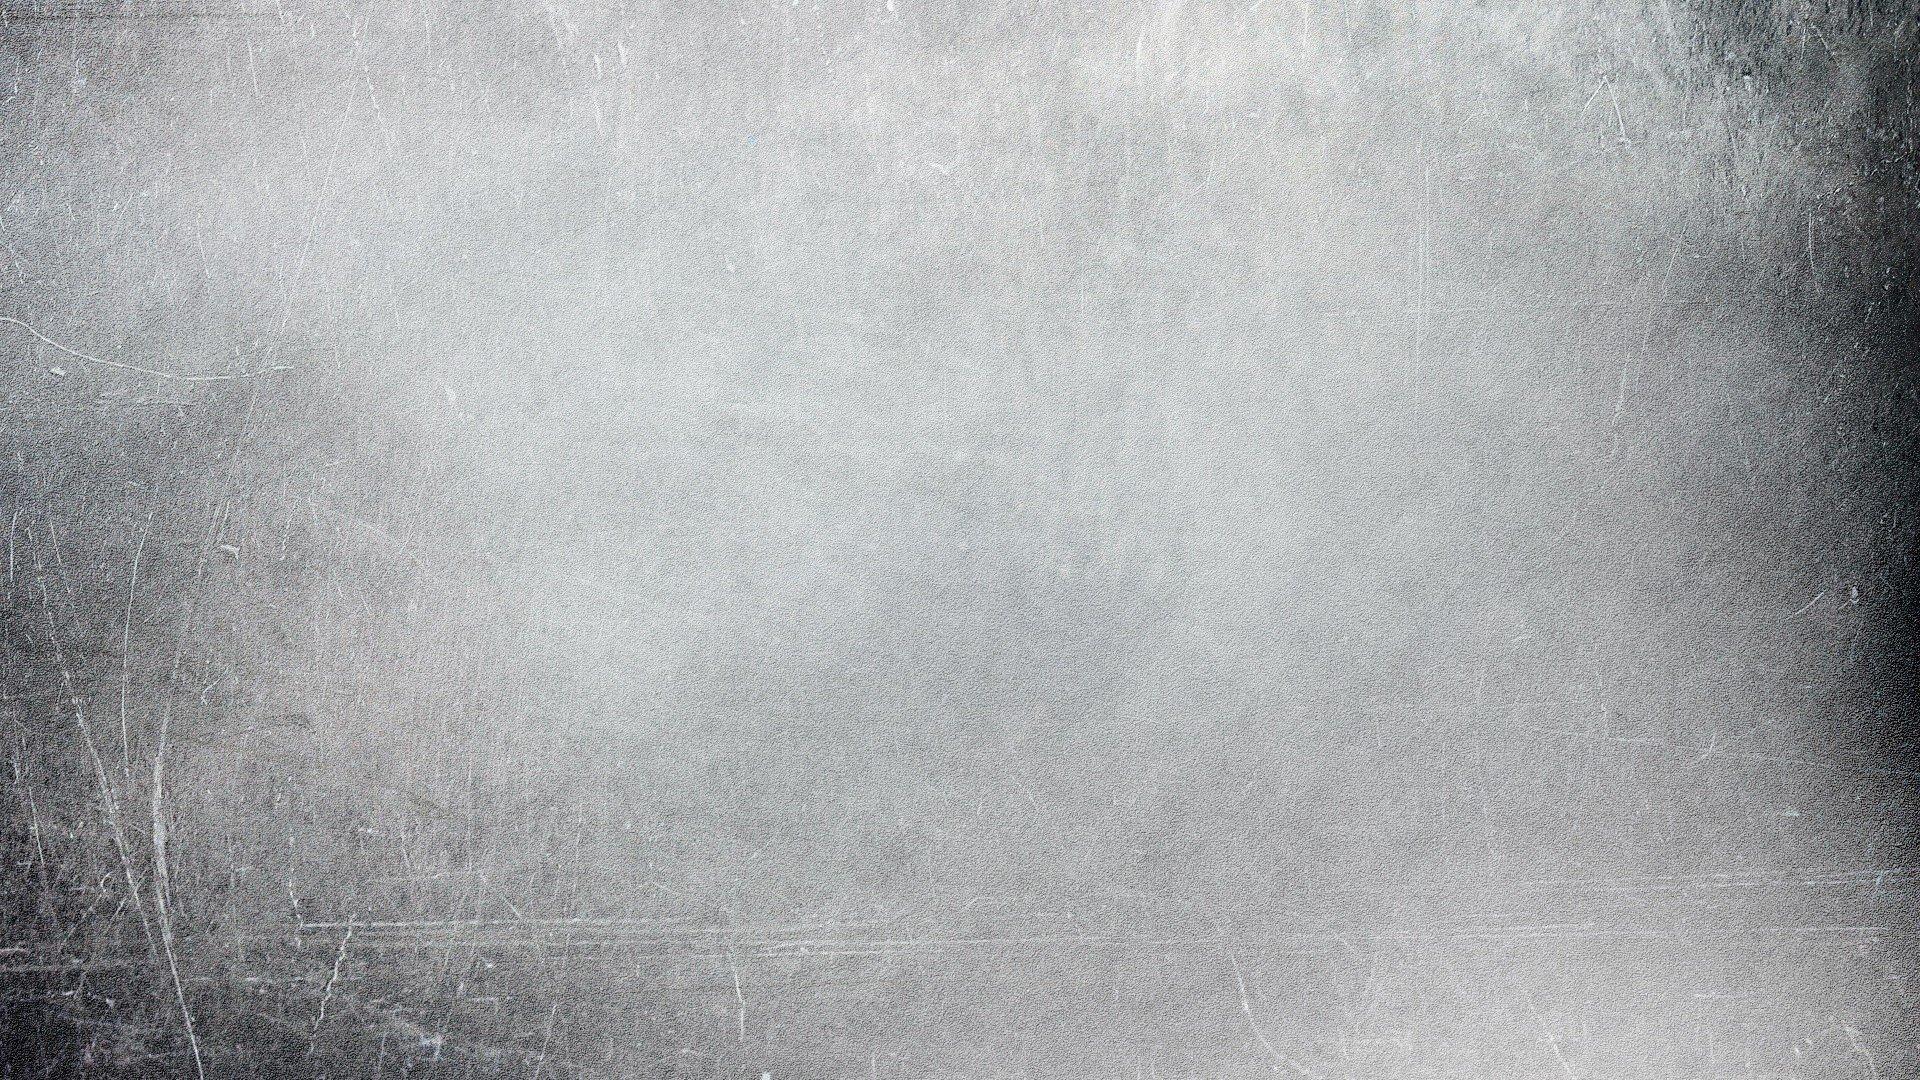 Free photo: Grey Grunge Texture - Backdrop, Light, Texture - Free ...